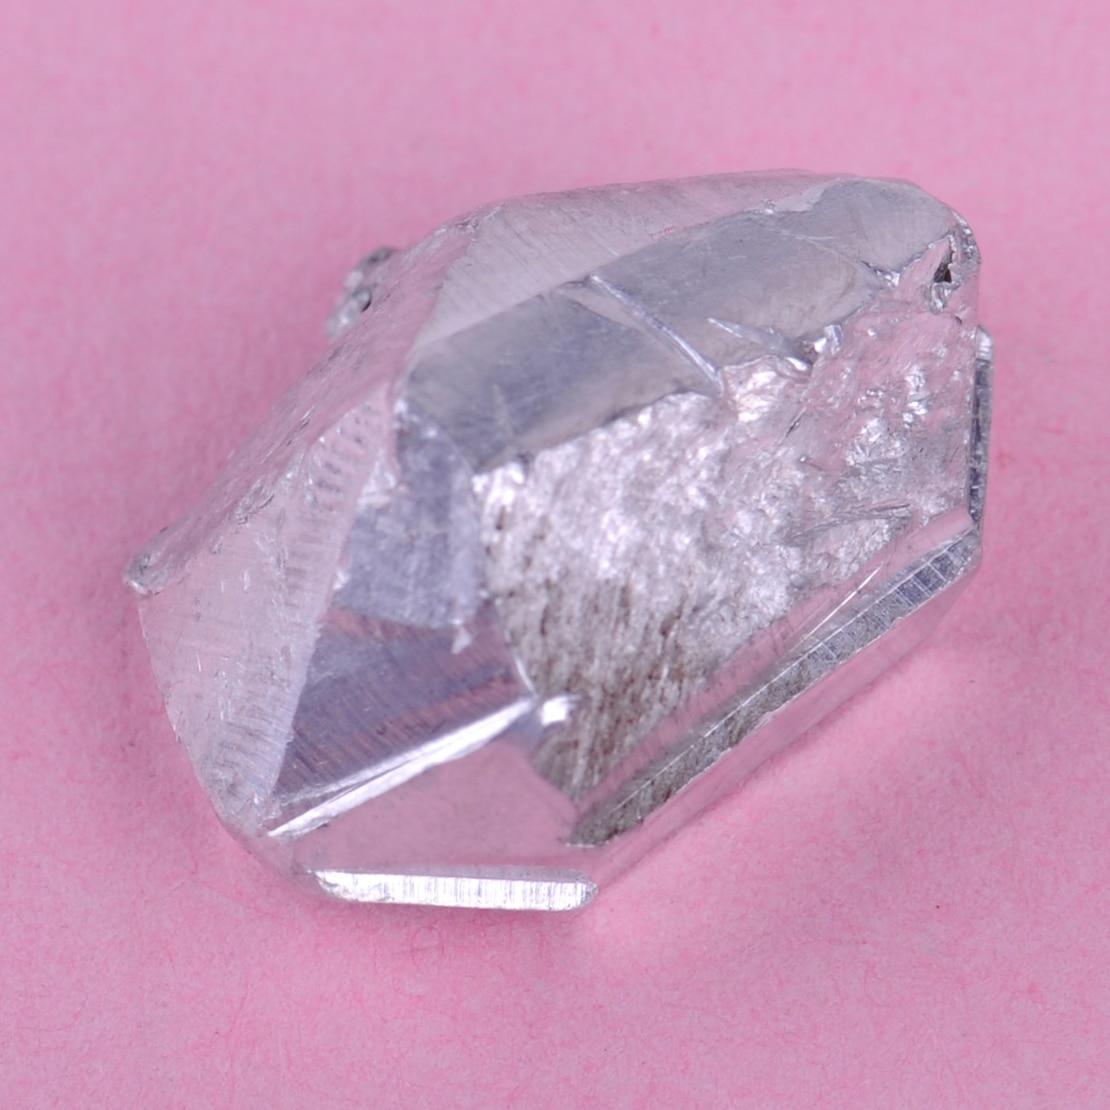 LETAOSK 10g 0.35oz High Purity 99.995 Pure Indium In Metal Bar Blocks Ingots Sample Experiments